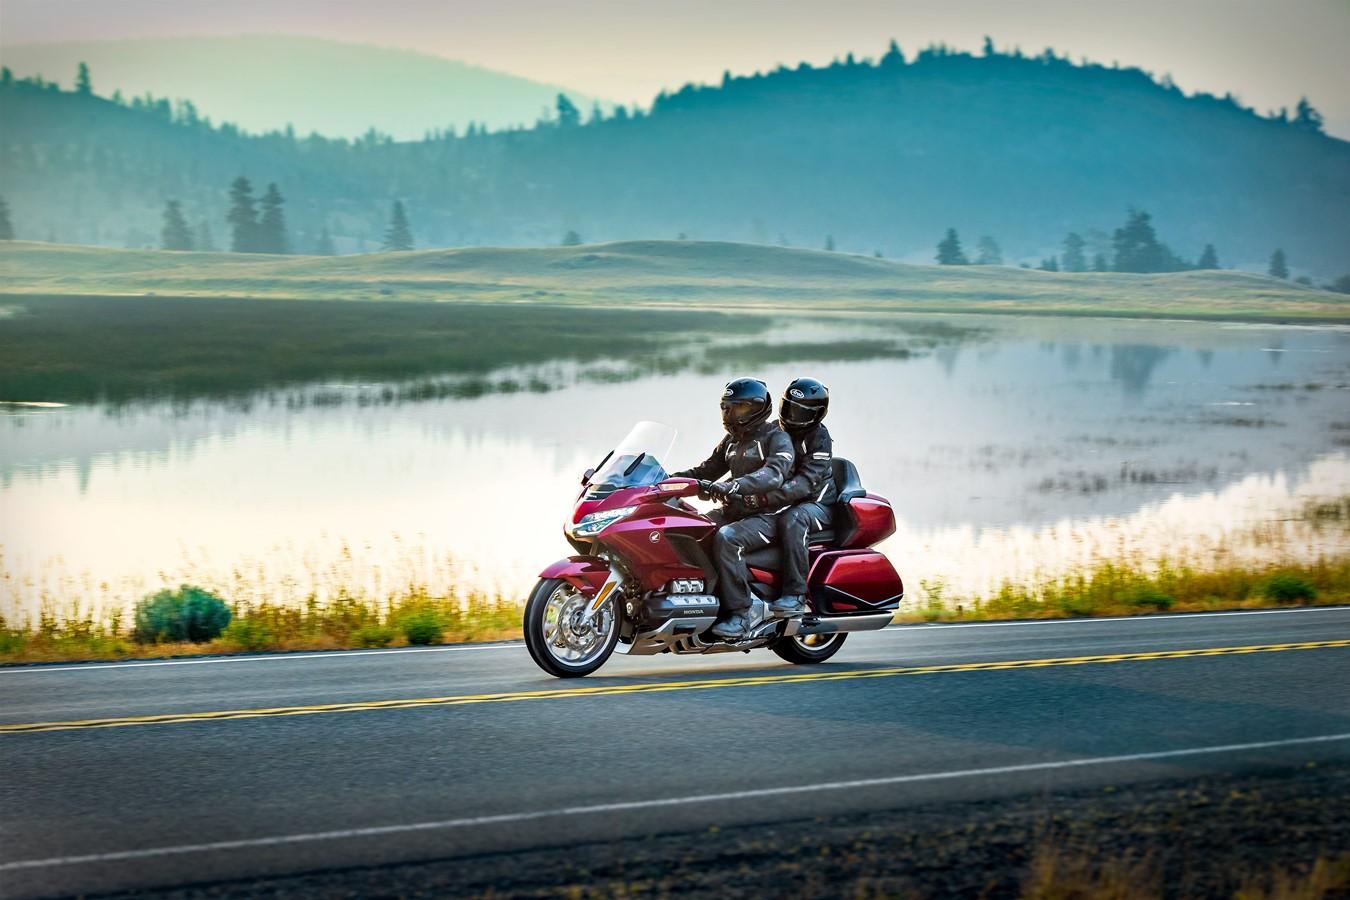 2018 HONDA GL1800 GOLD WING